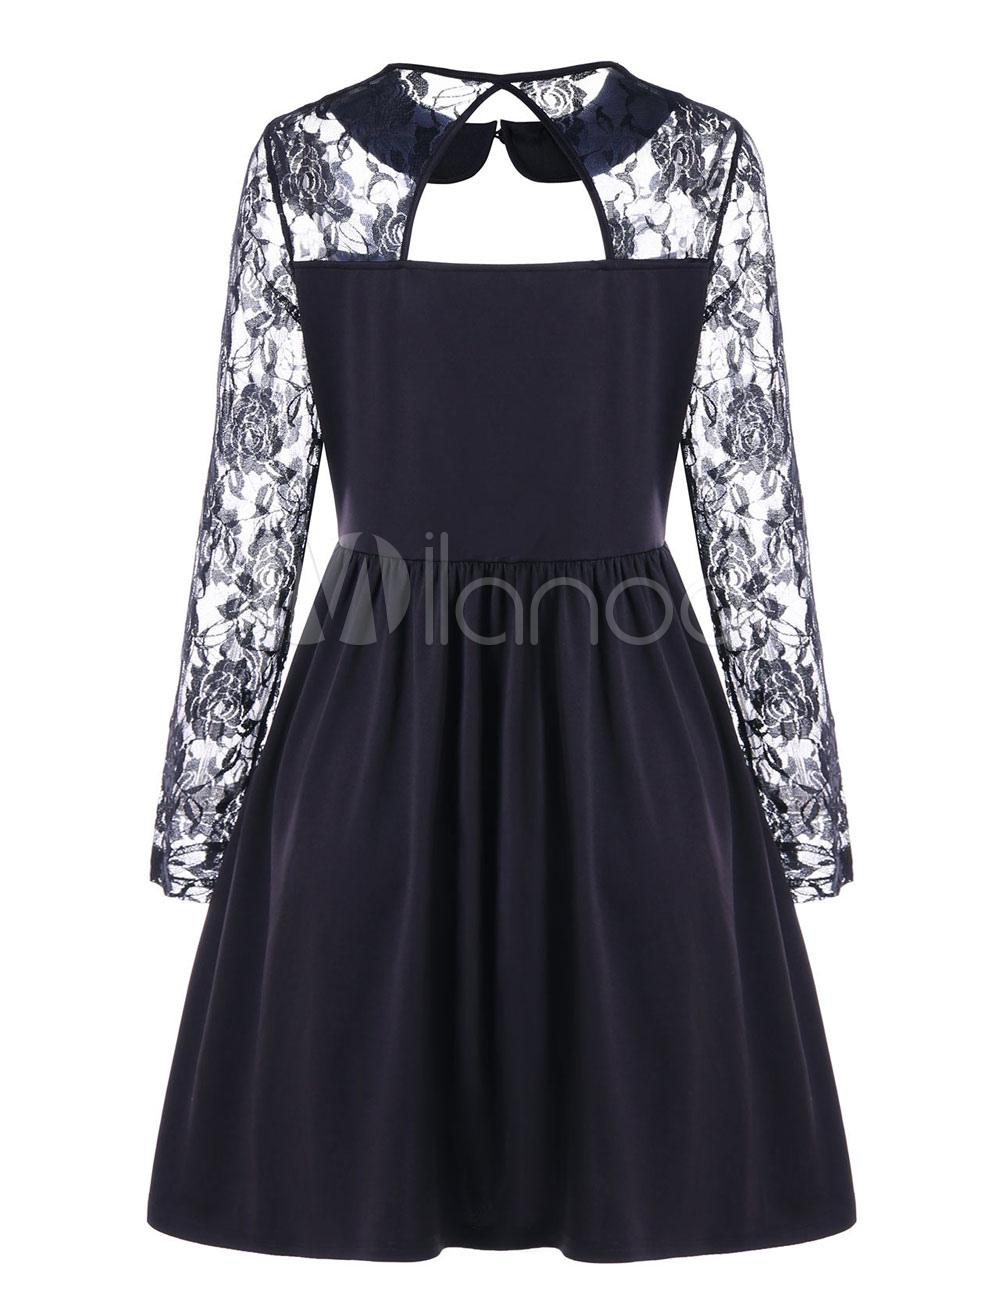 Buy Black Skater Dress Women Dress Peter Pan Collar Lace Long Sleeve Slim Fit Skater Dress for $22.99 in Milanoo store